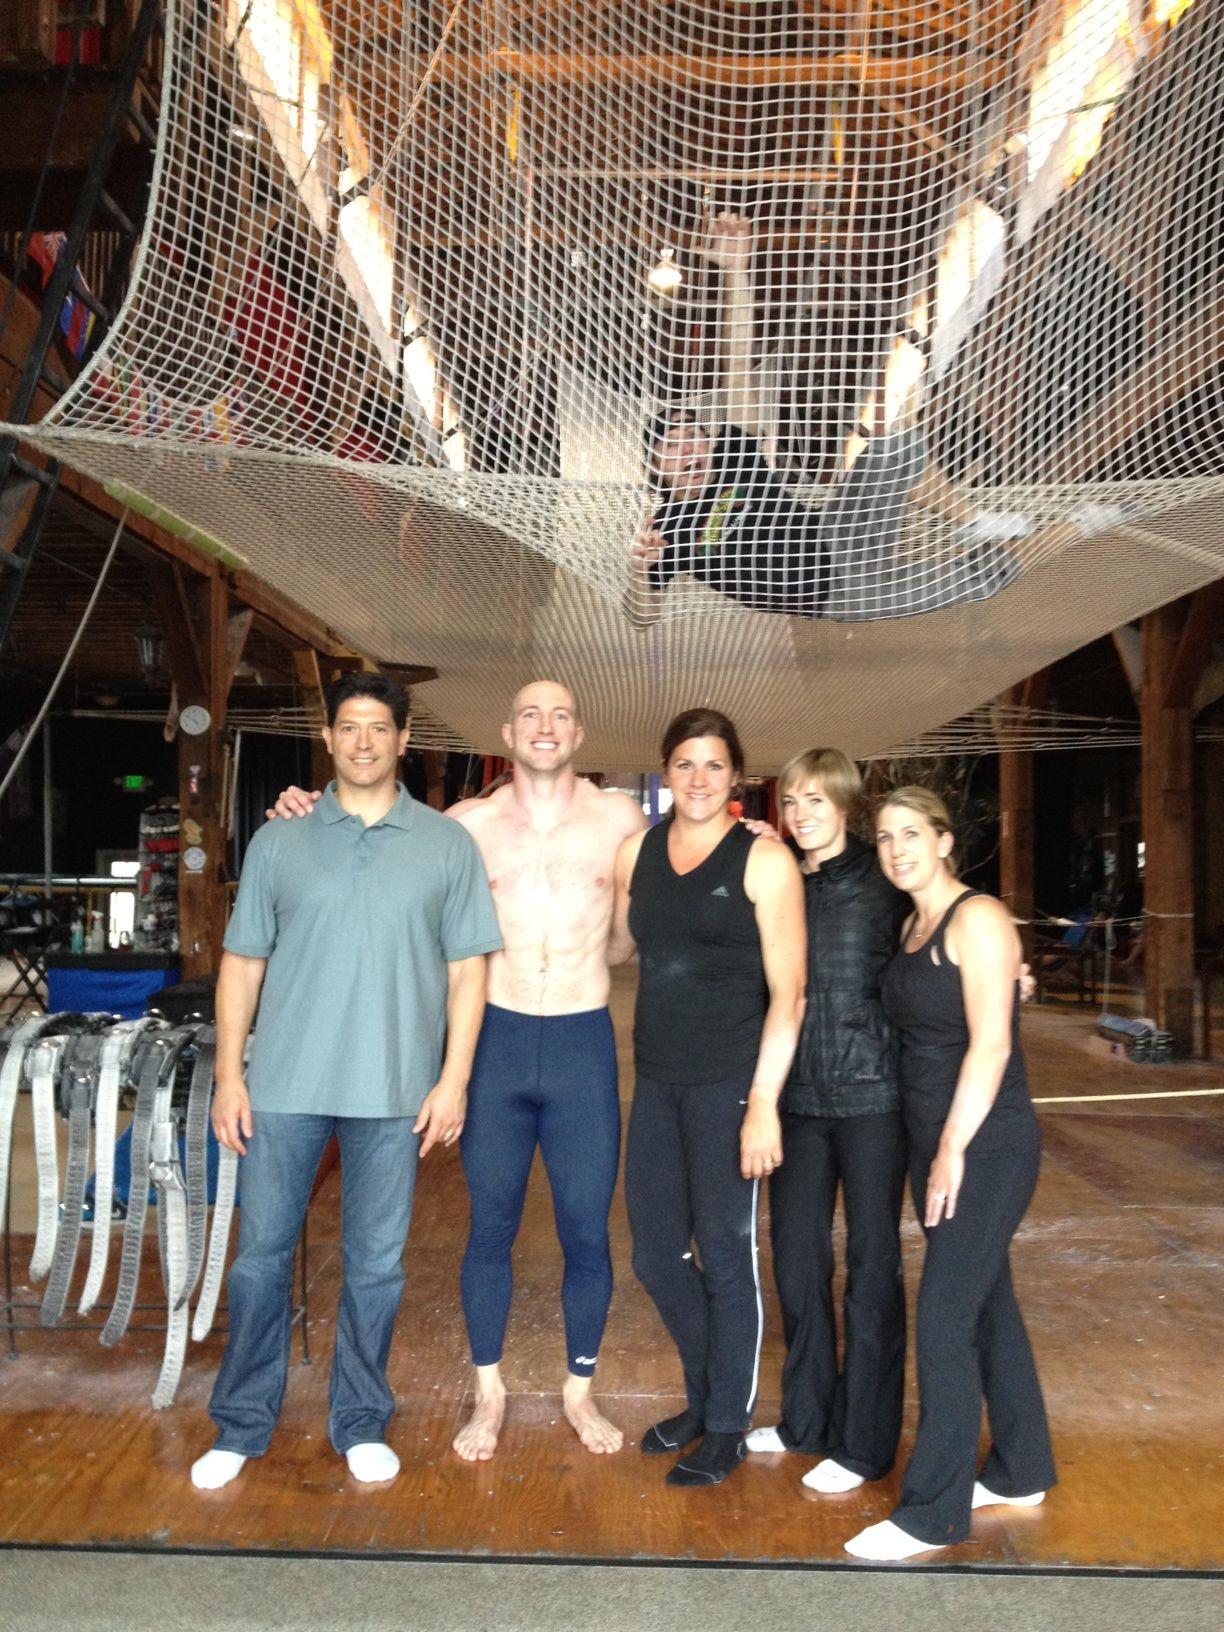 Korrio Marketing Team trip to Emerald City Trapeze Arts in